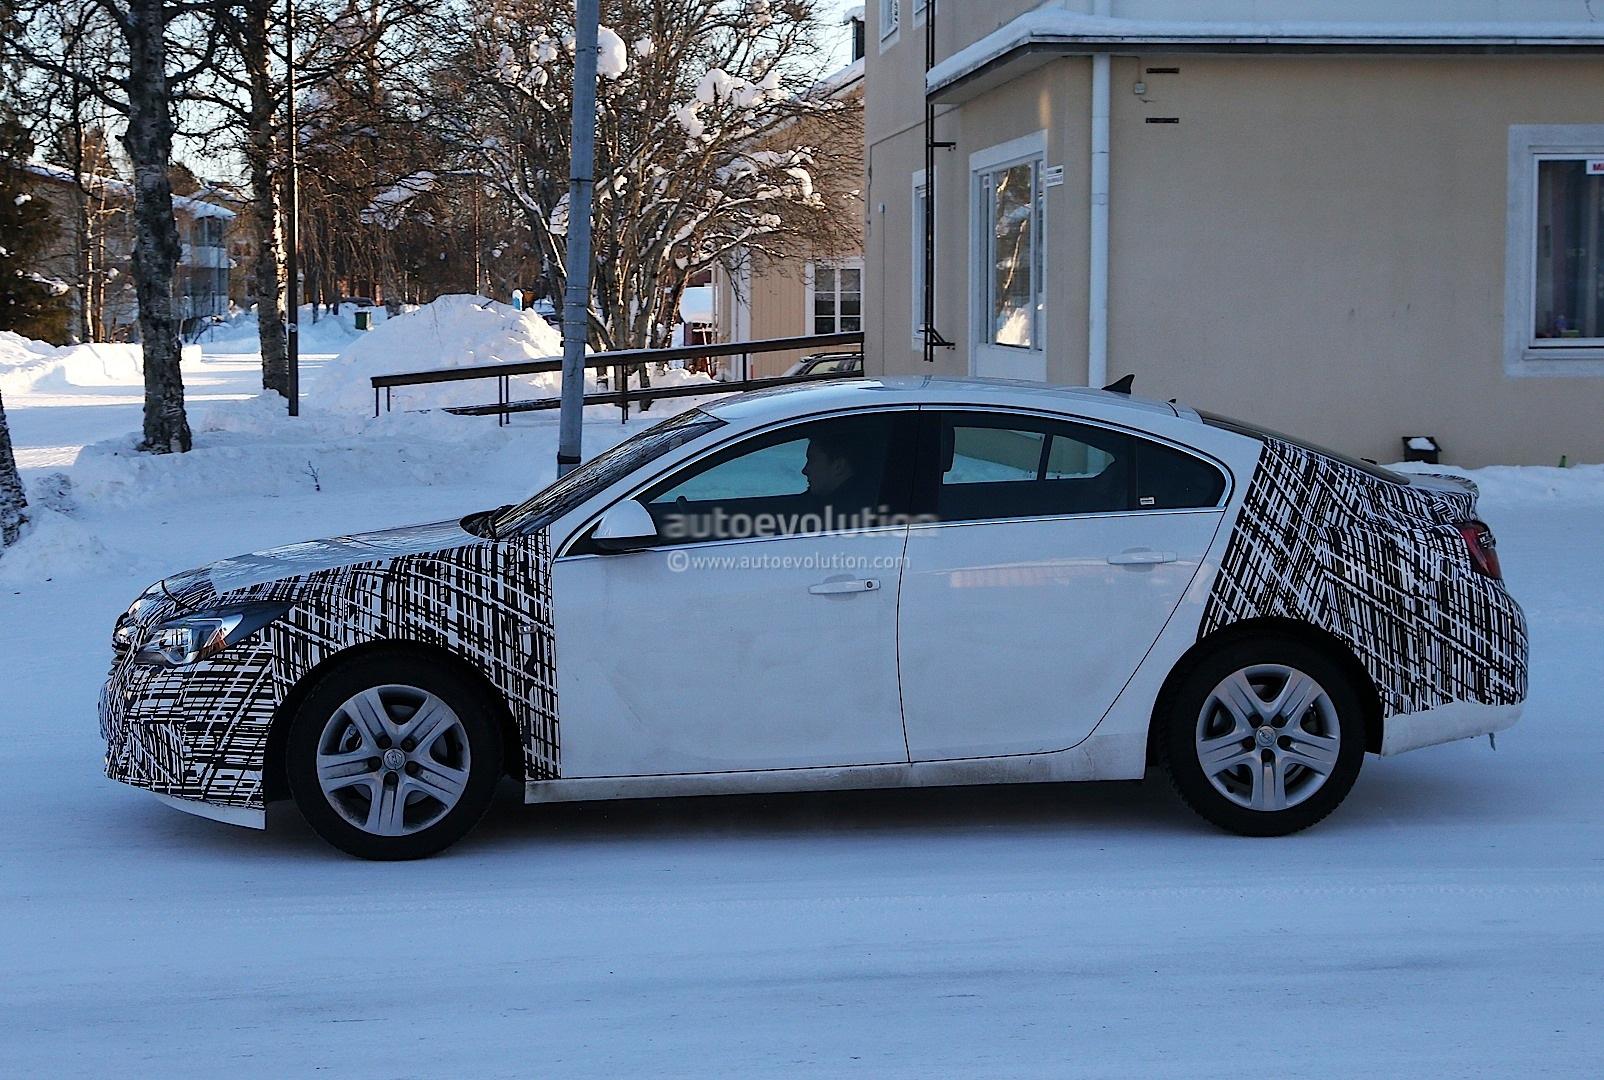 Spyshots: Opel / Vauxhall Insignia Facelift Sports New Headlights